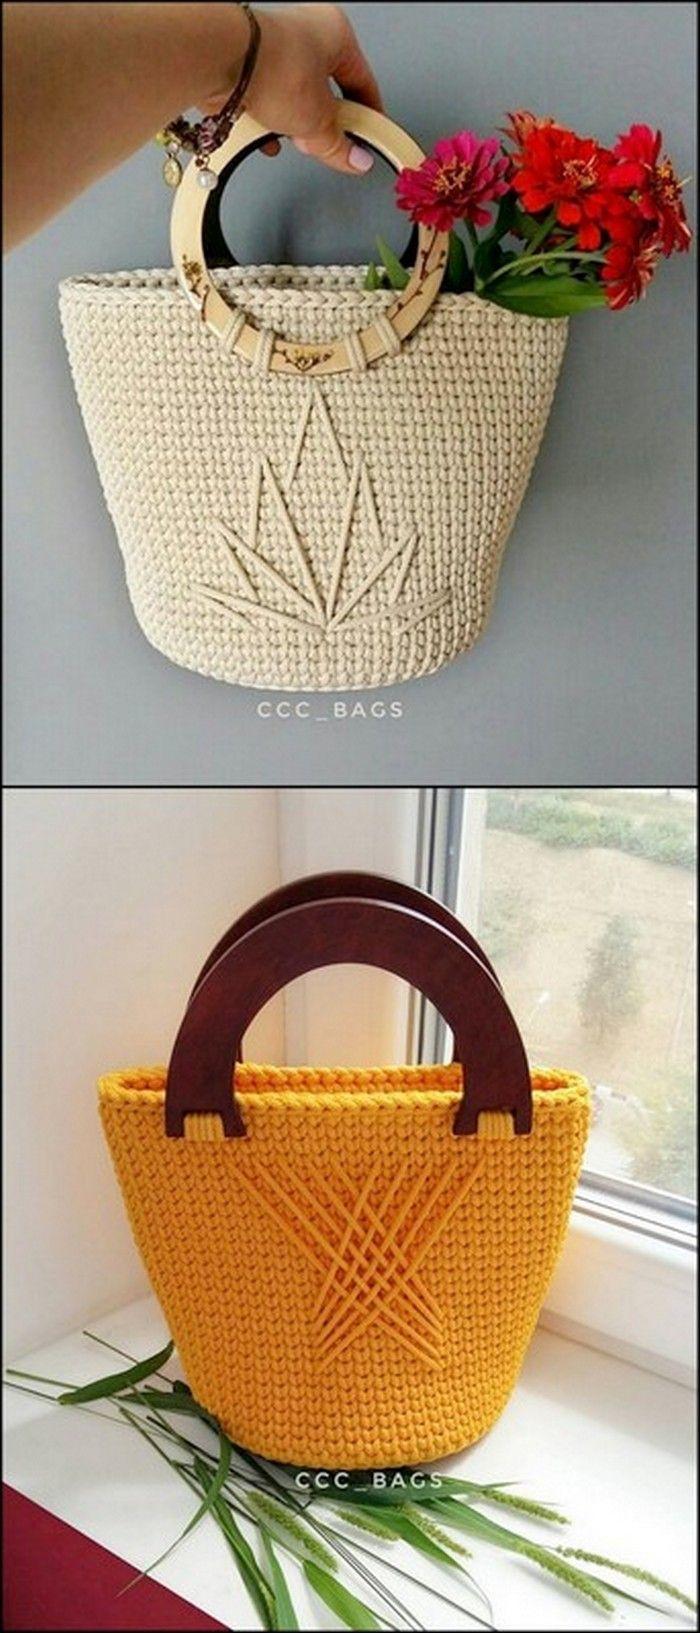 Stiffed And Wooden Handle Basket Free Crochet Pattern Diy Bags Patterns Crochet Purse Pattern Free Crochet Purse Patterns